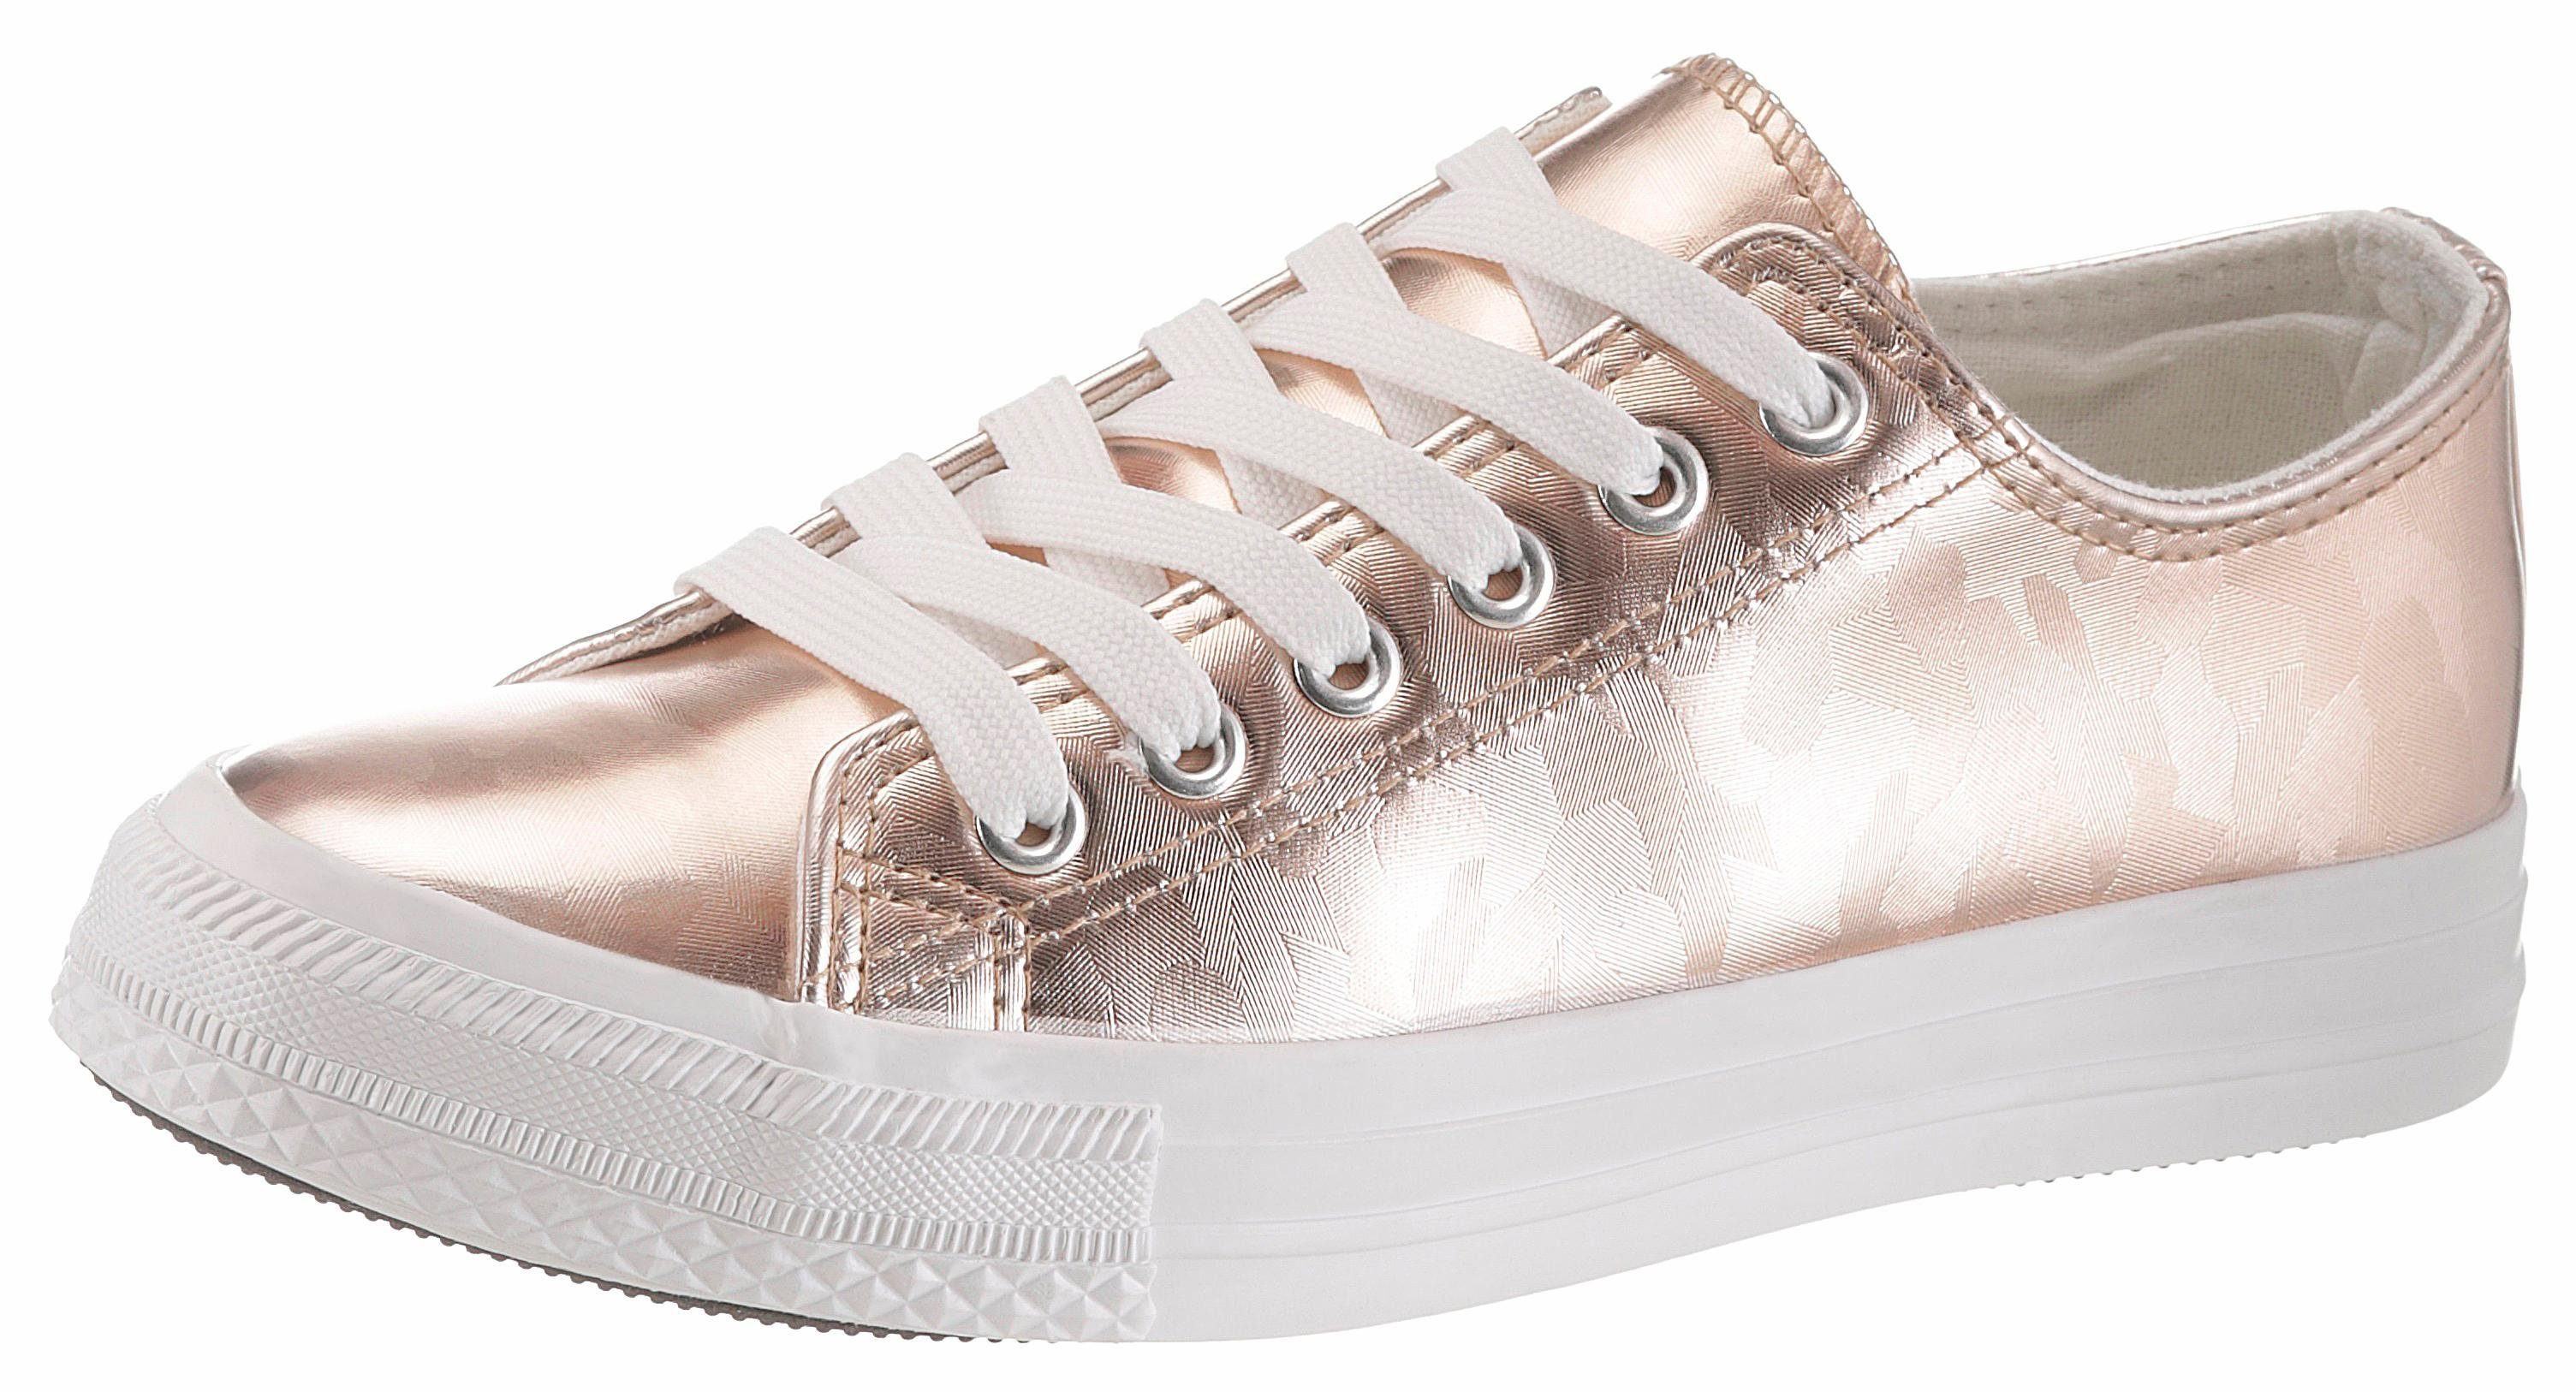 HaILY'S »Vicky« Sneaker im Metallic-Look